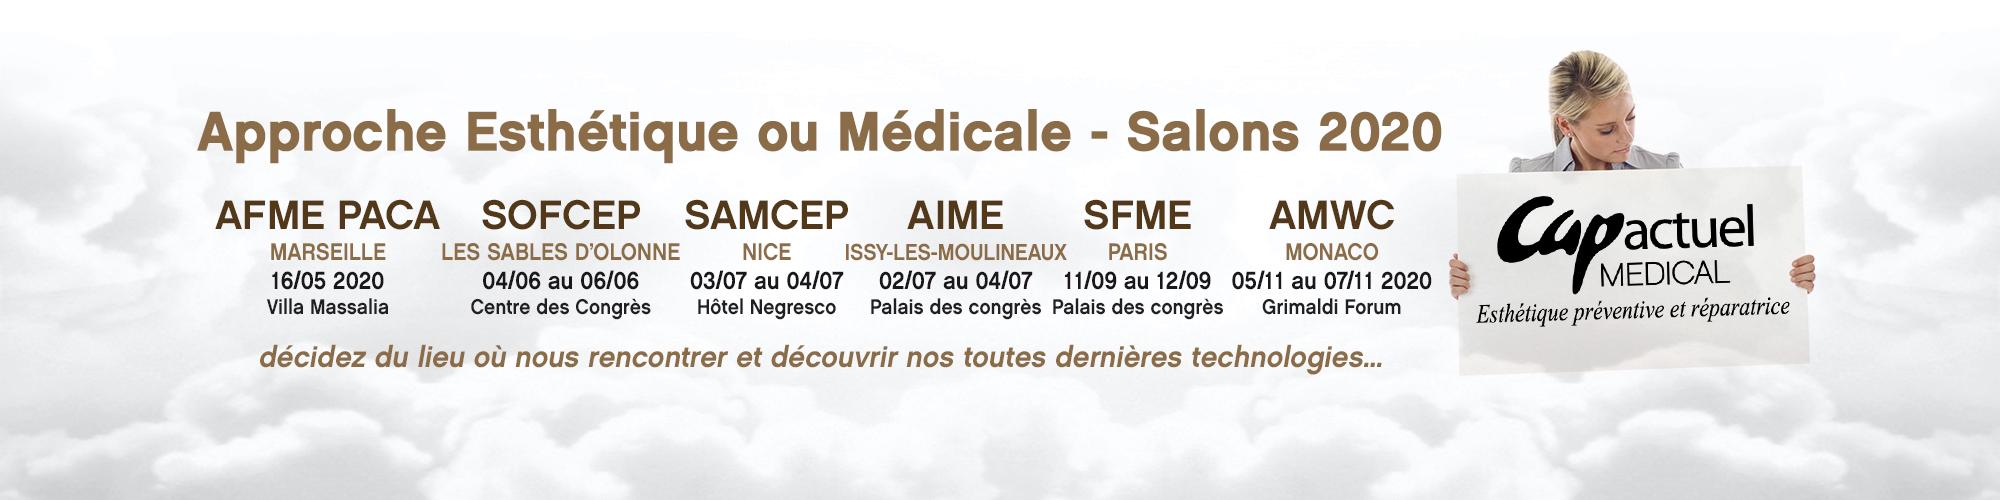 https://www.capactuel.com/storage/app/media/Carousel/accueil/bannieresalonsRDV.jpg